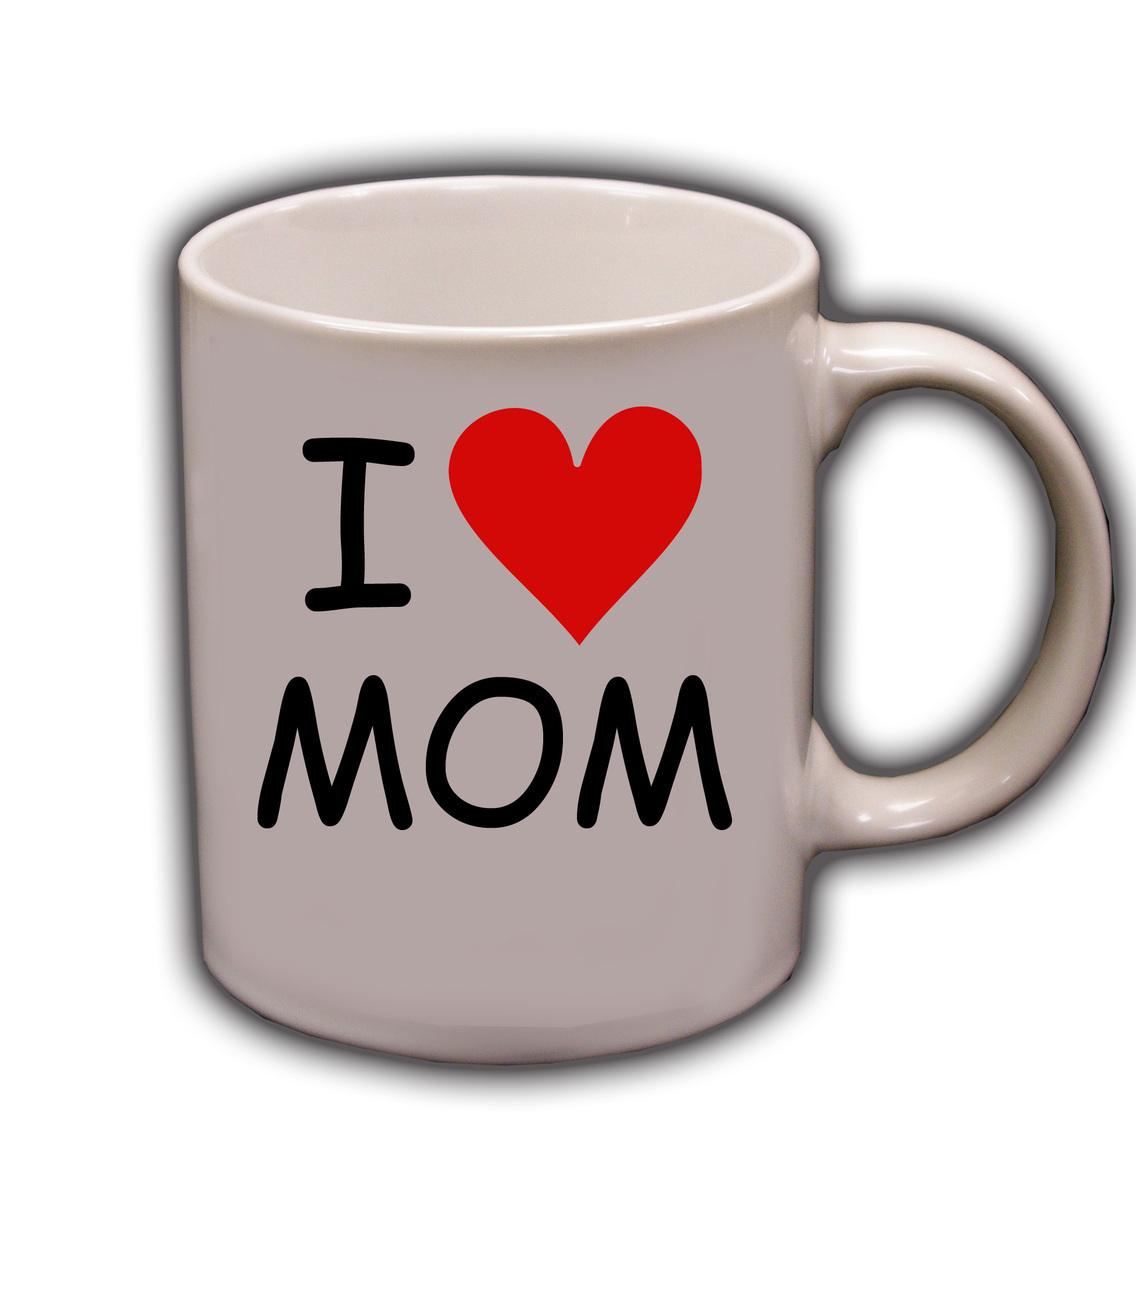 Mothers day mug 11oz side 2  4